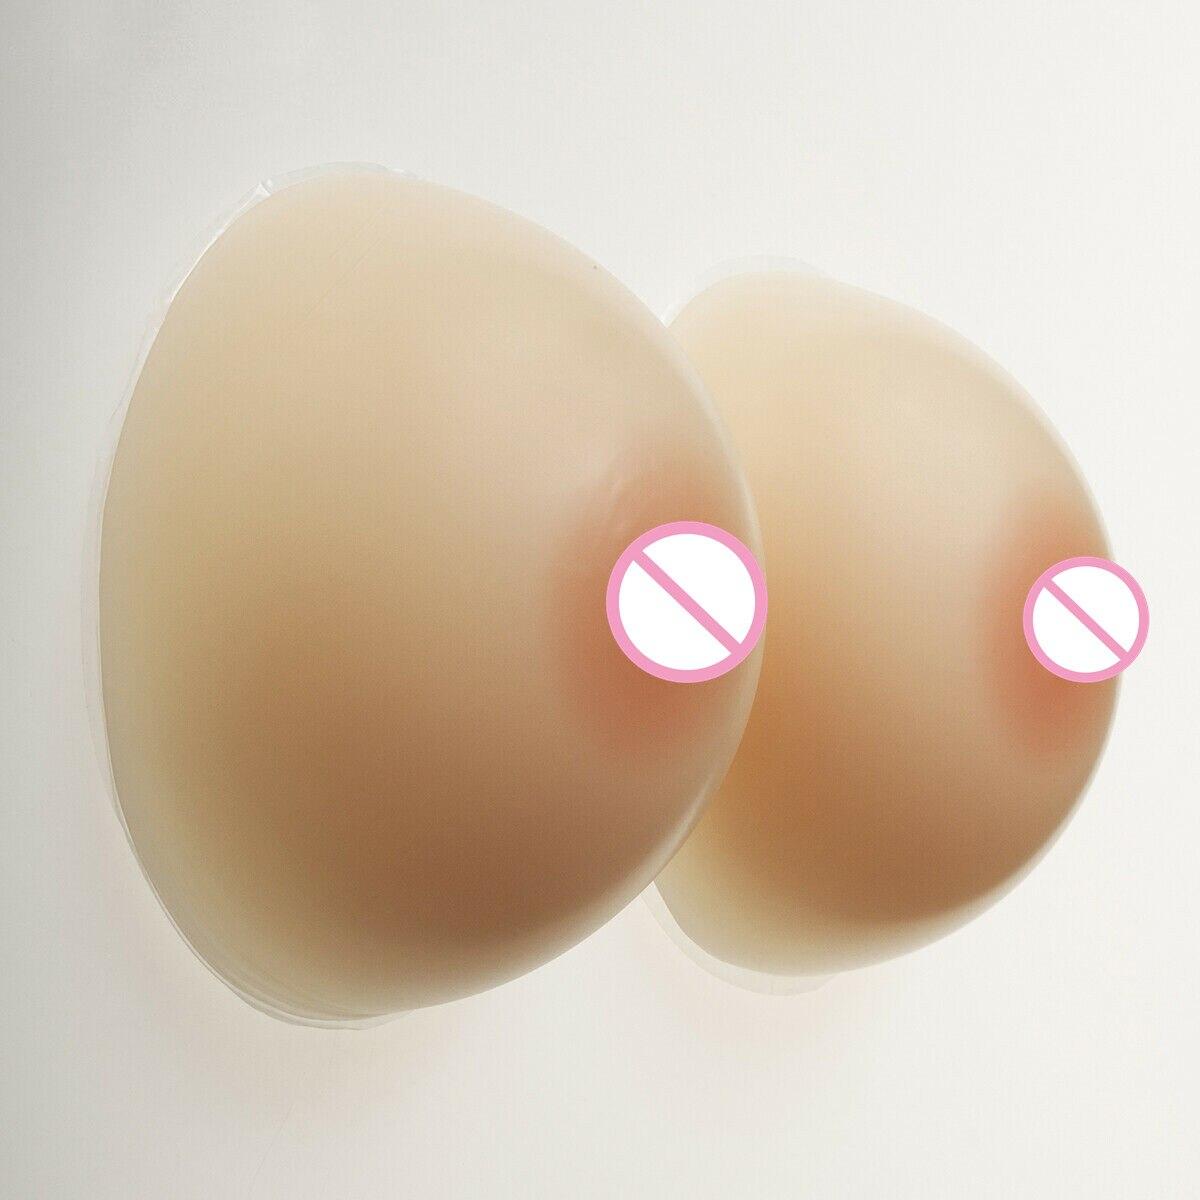 IVITA 1400 g/paire Silicone poitrine formes TG Crossdresser faux seins E tasse seins soutien-gorge Push Up sans fil soutien-gorge rose soutien-gorge